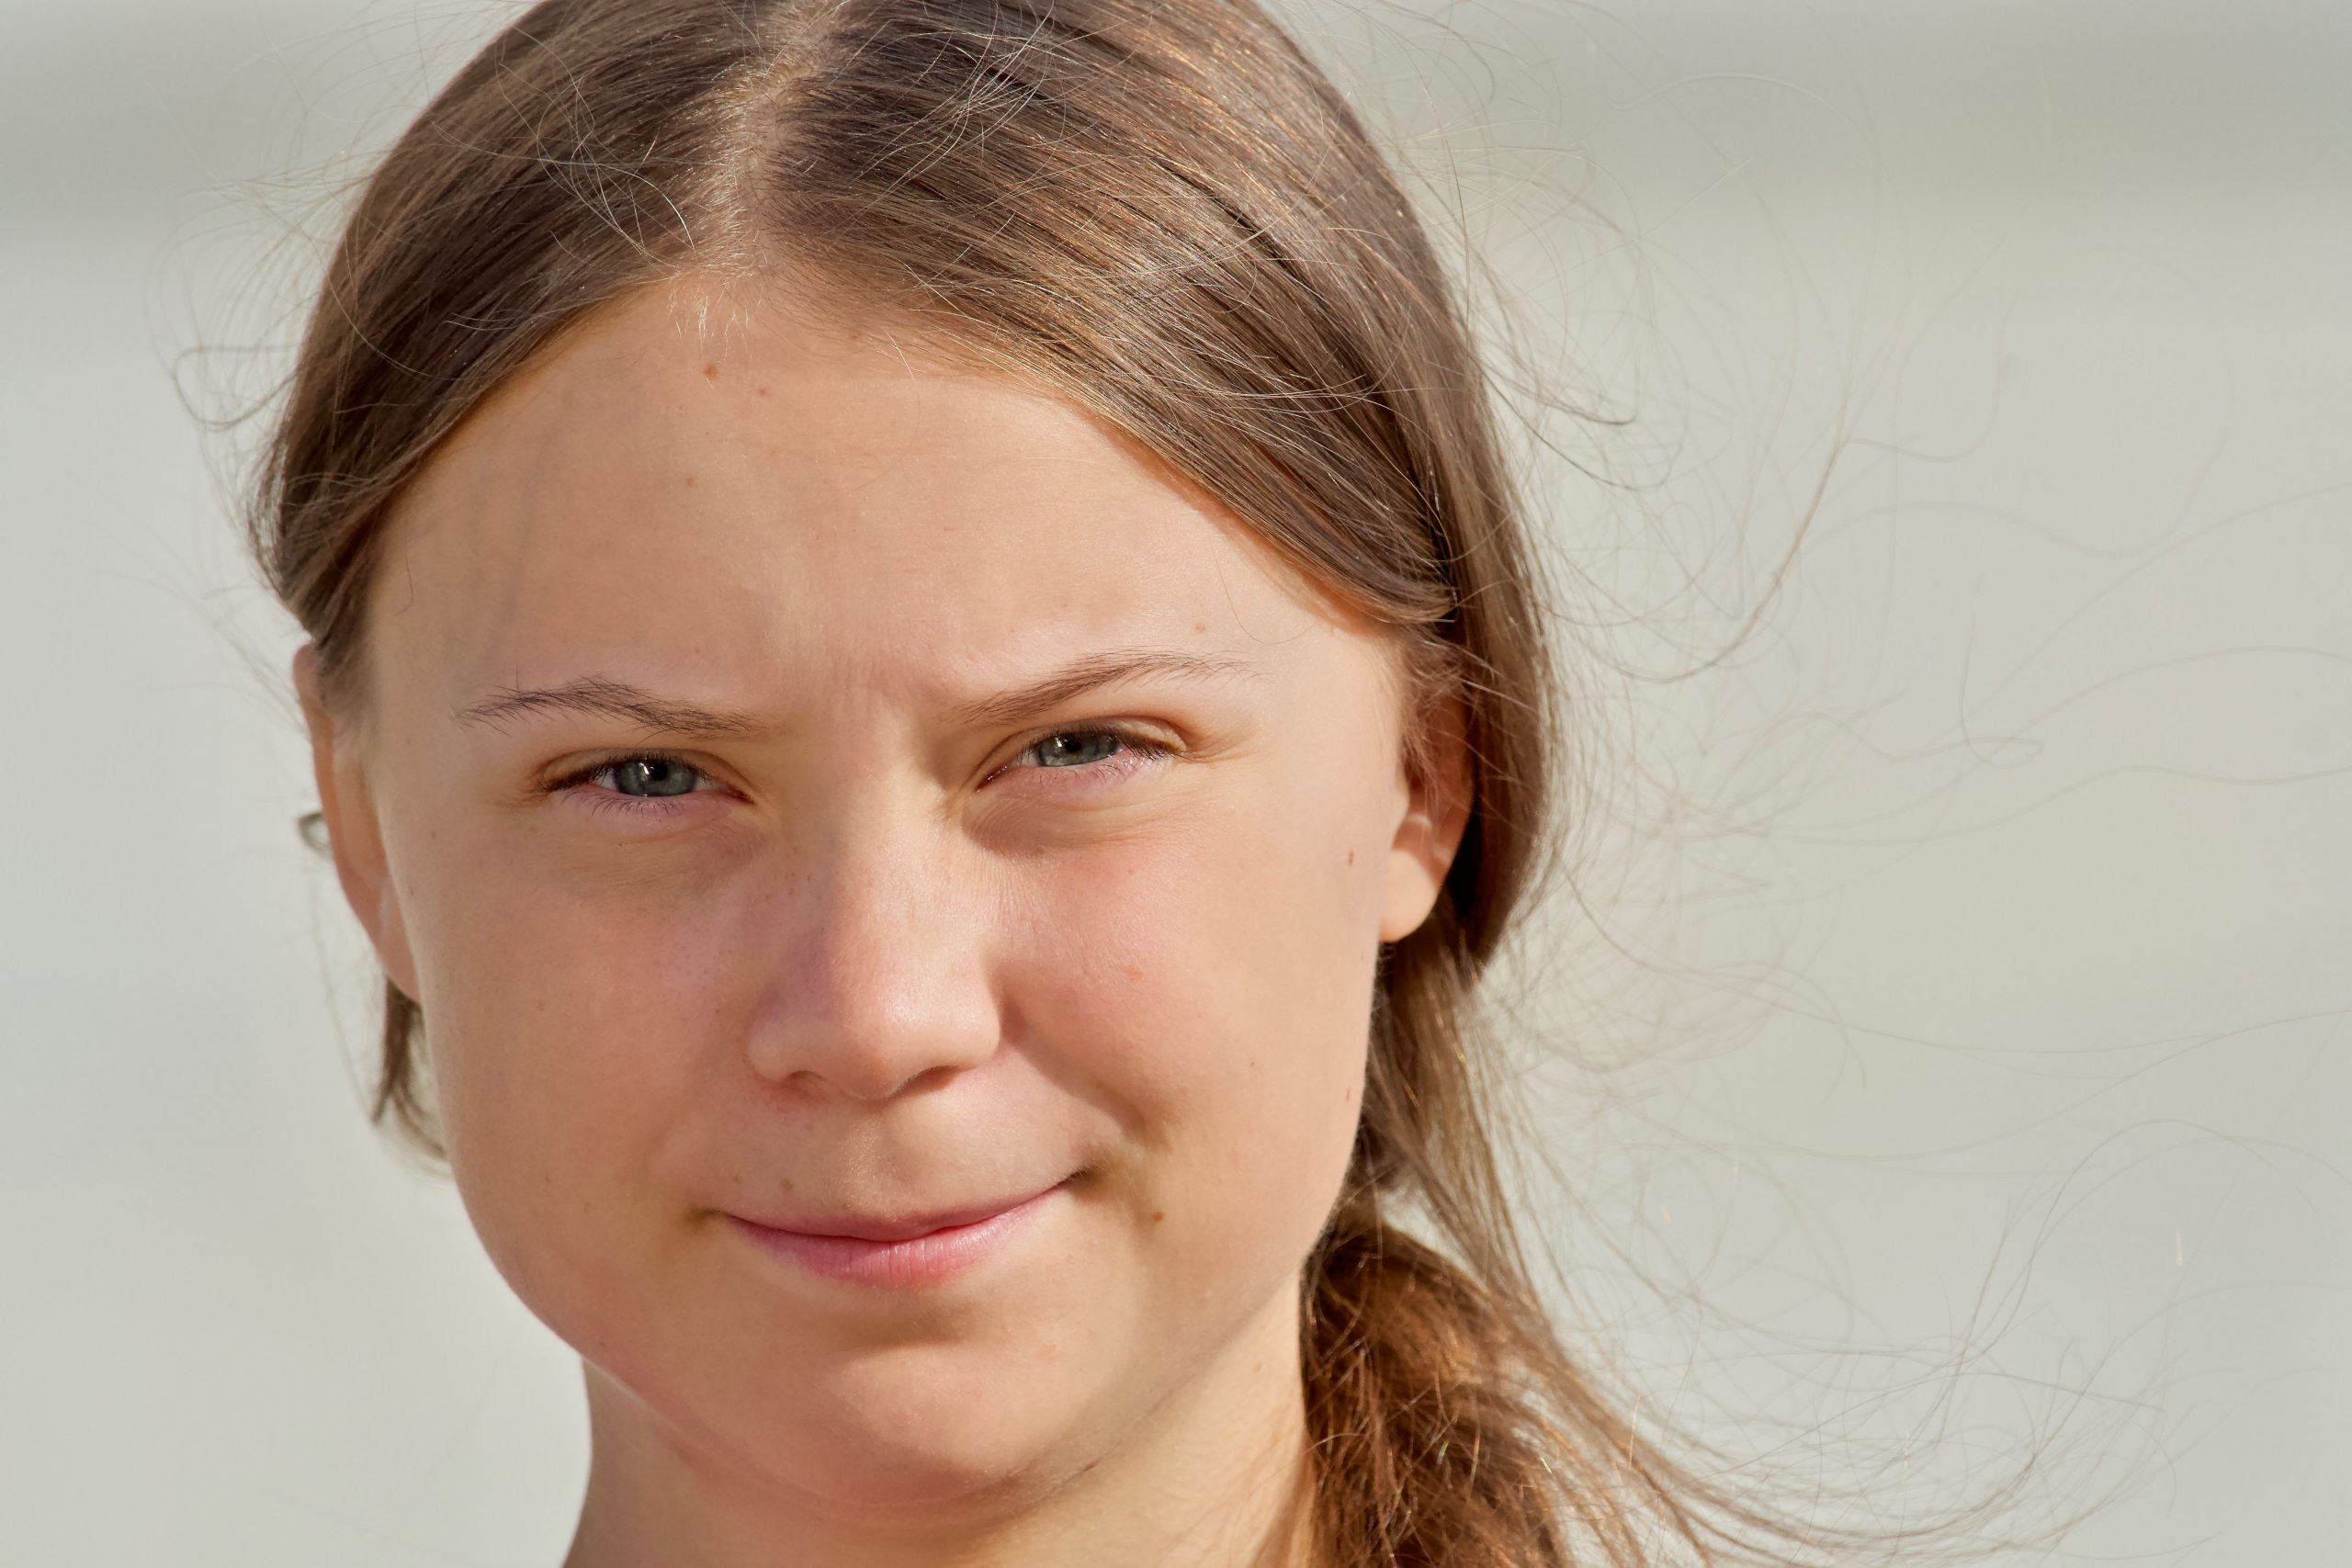 Gretu Tunberg